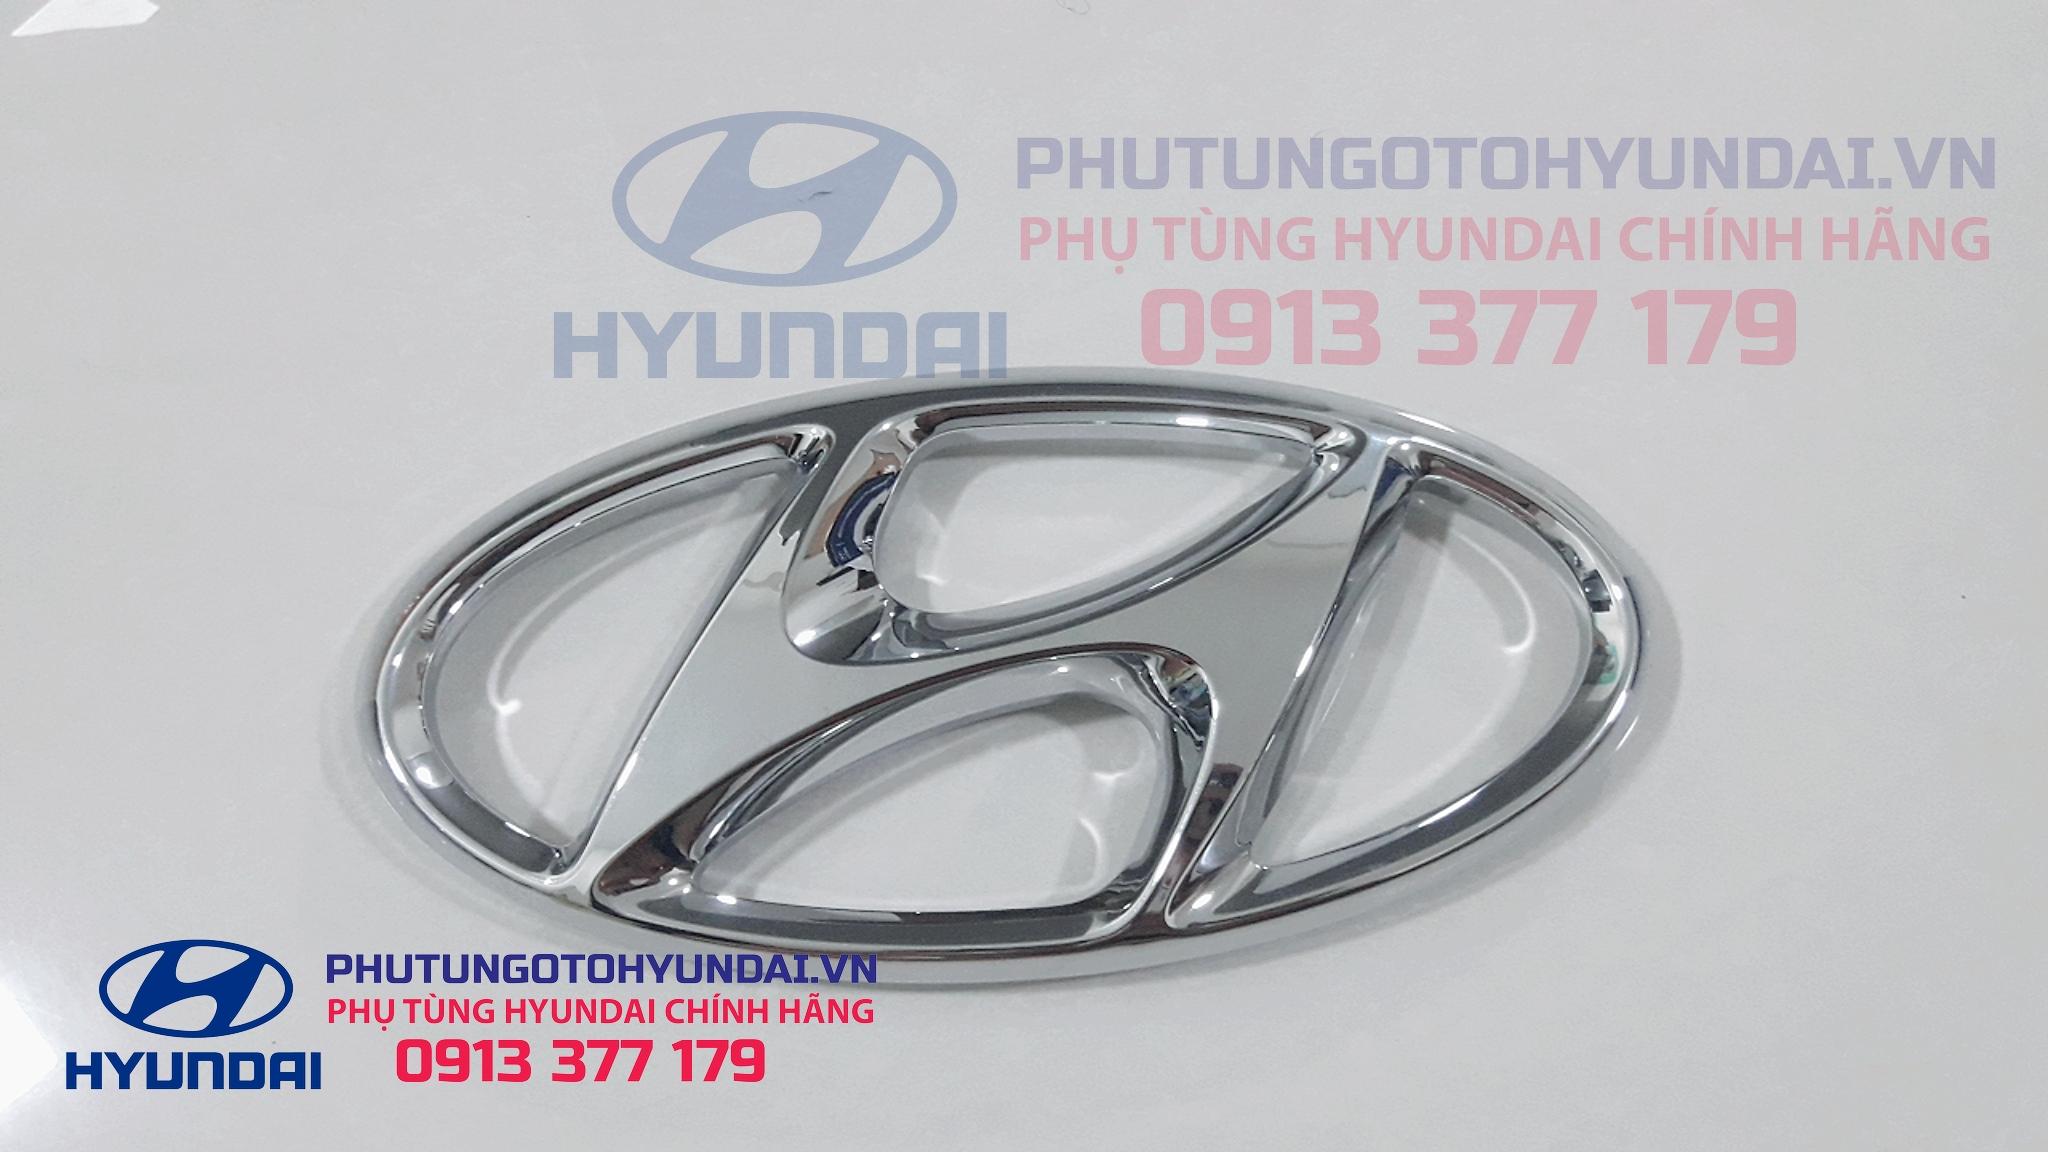 LOGO H CA LĂNG HYUNDAI 86300-5900